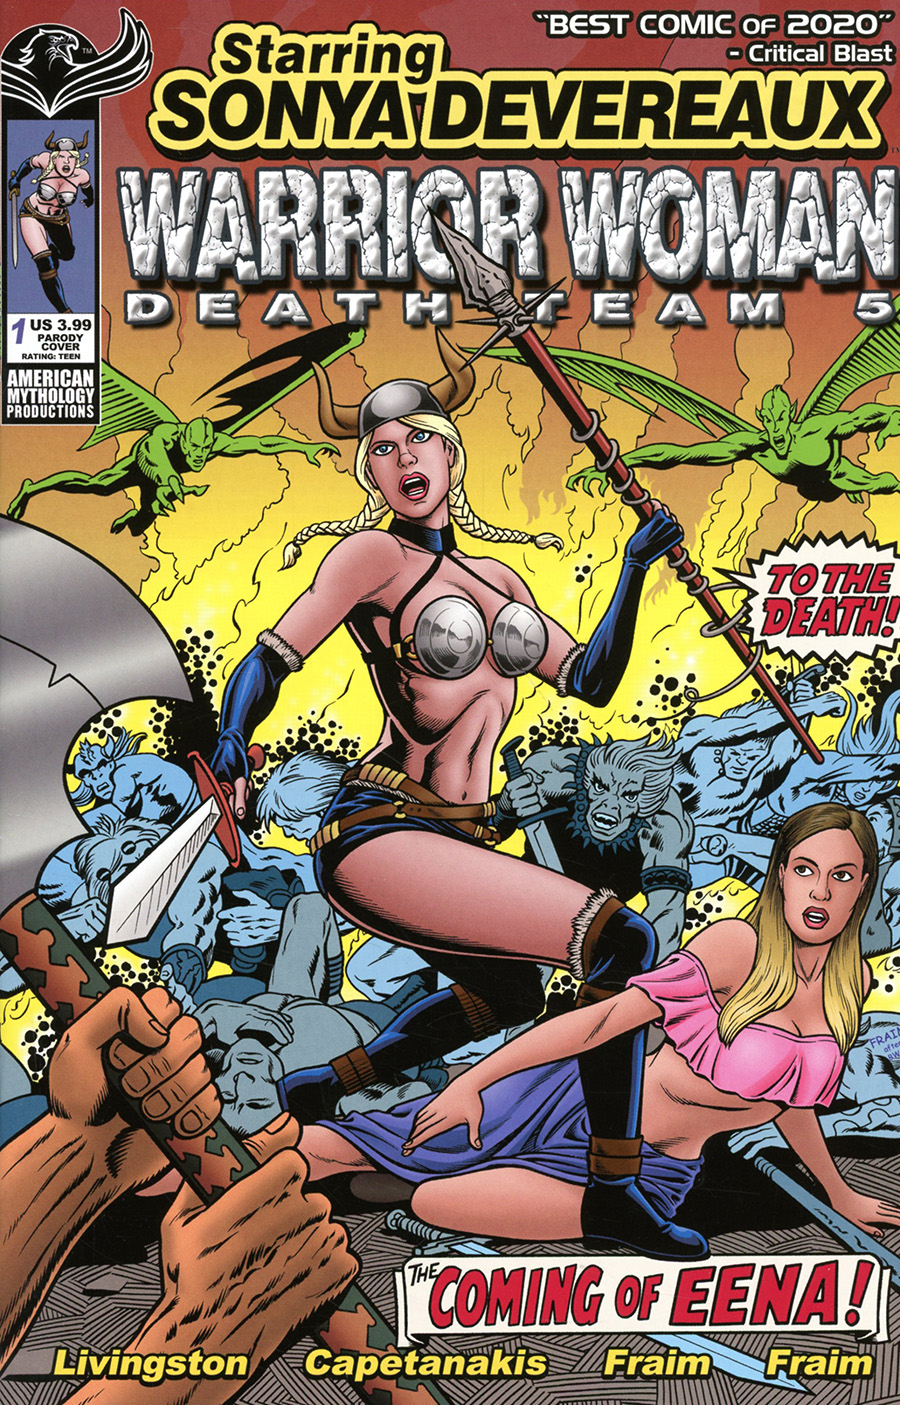 Starring Sonya Devereaux Warrior Women Death Team 5 #1 (One Shot) Cover B Variant Parody Cover